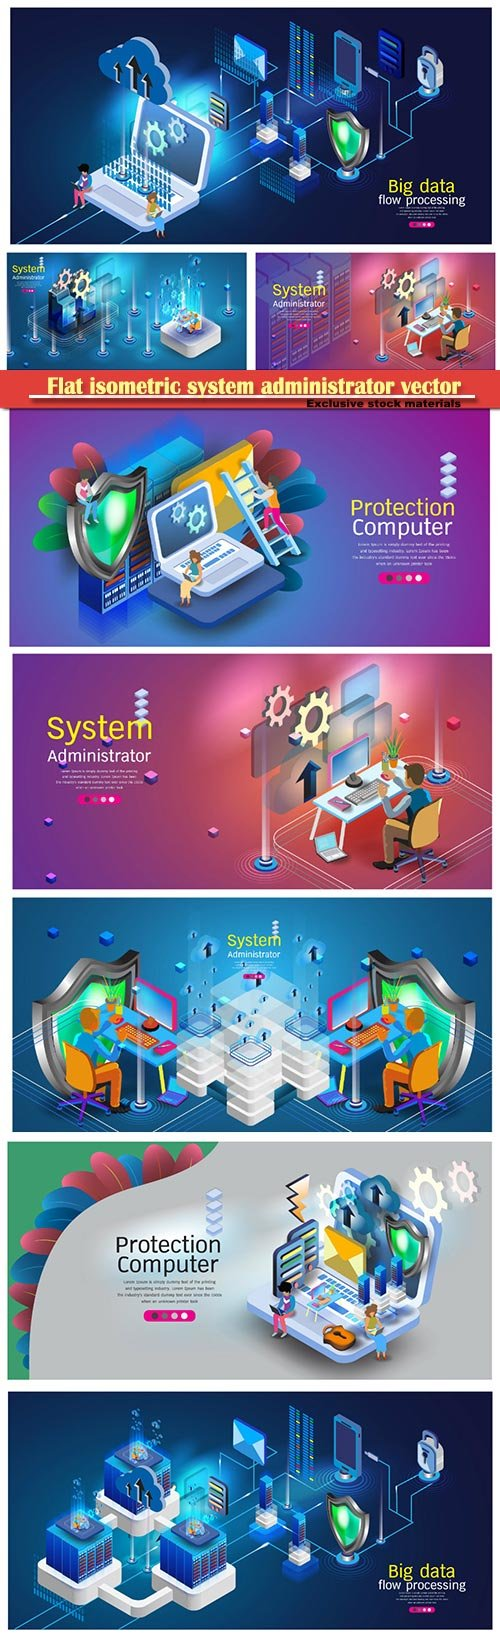 Flat isometric system administrator vector illustration